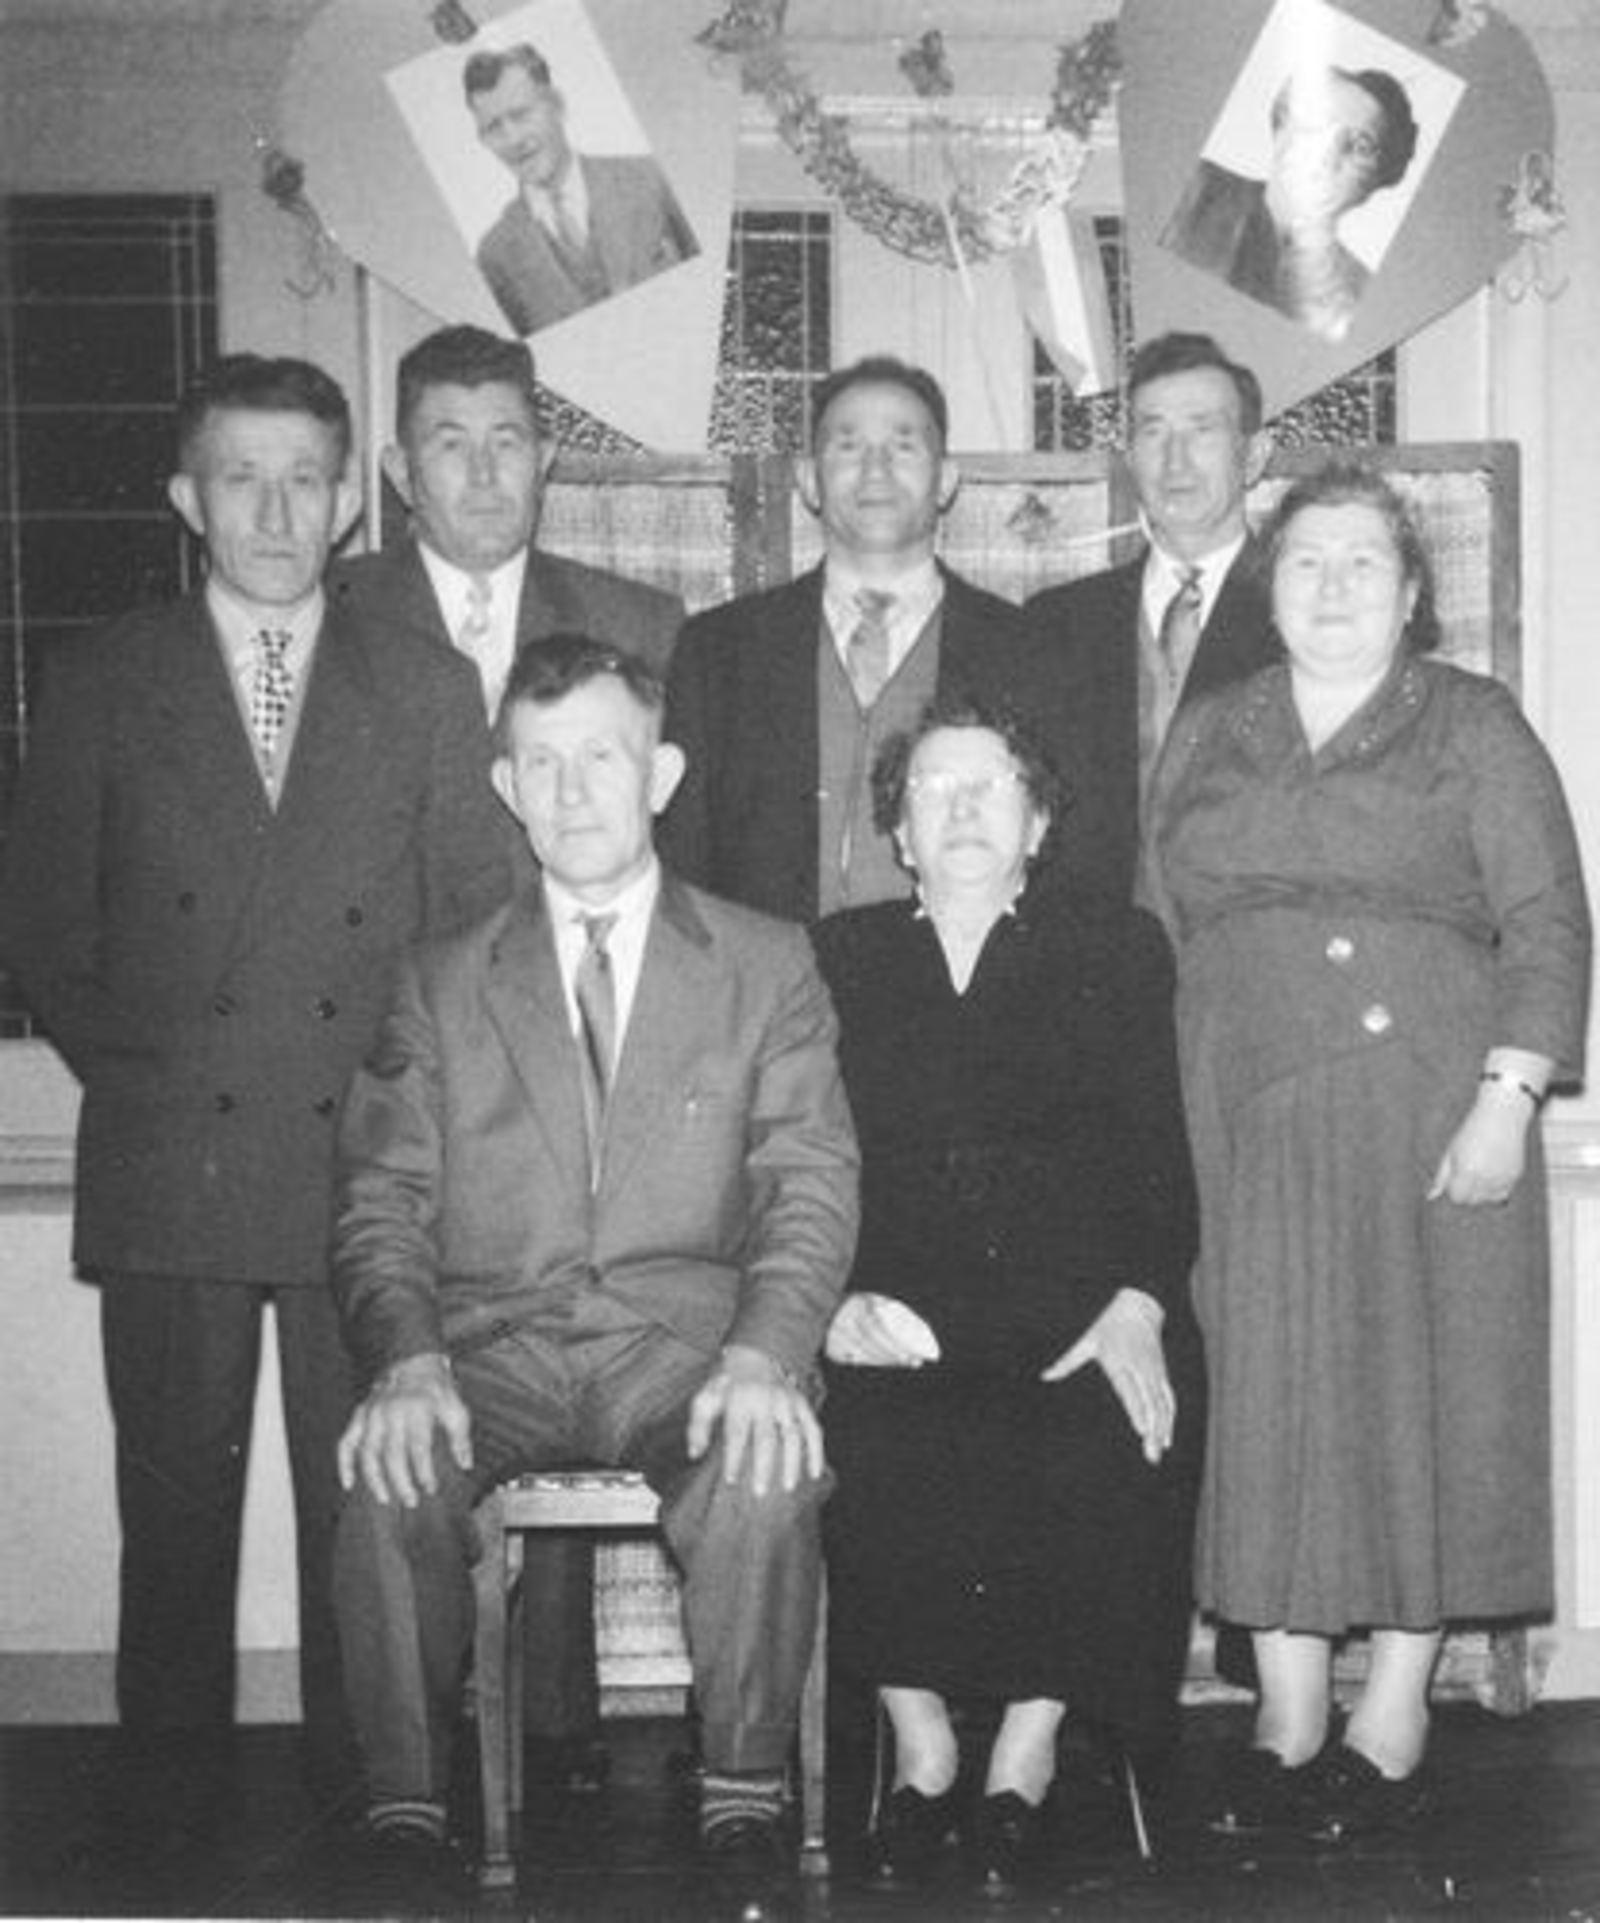 Dam-Stroomer Fam 1956 Onbekend Trouwerij 01